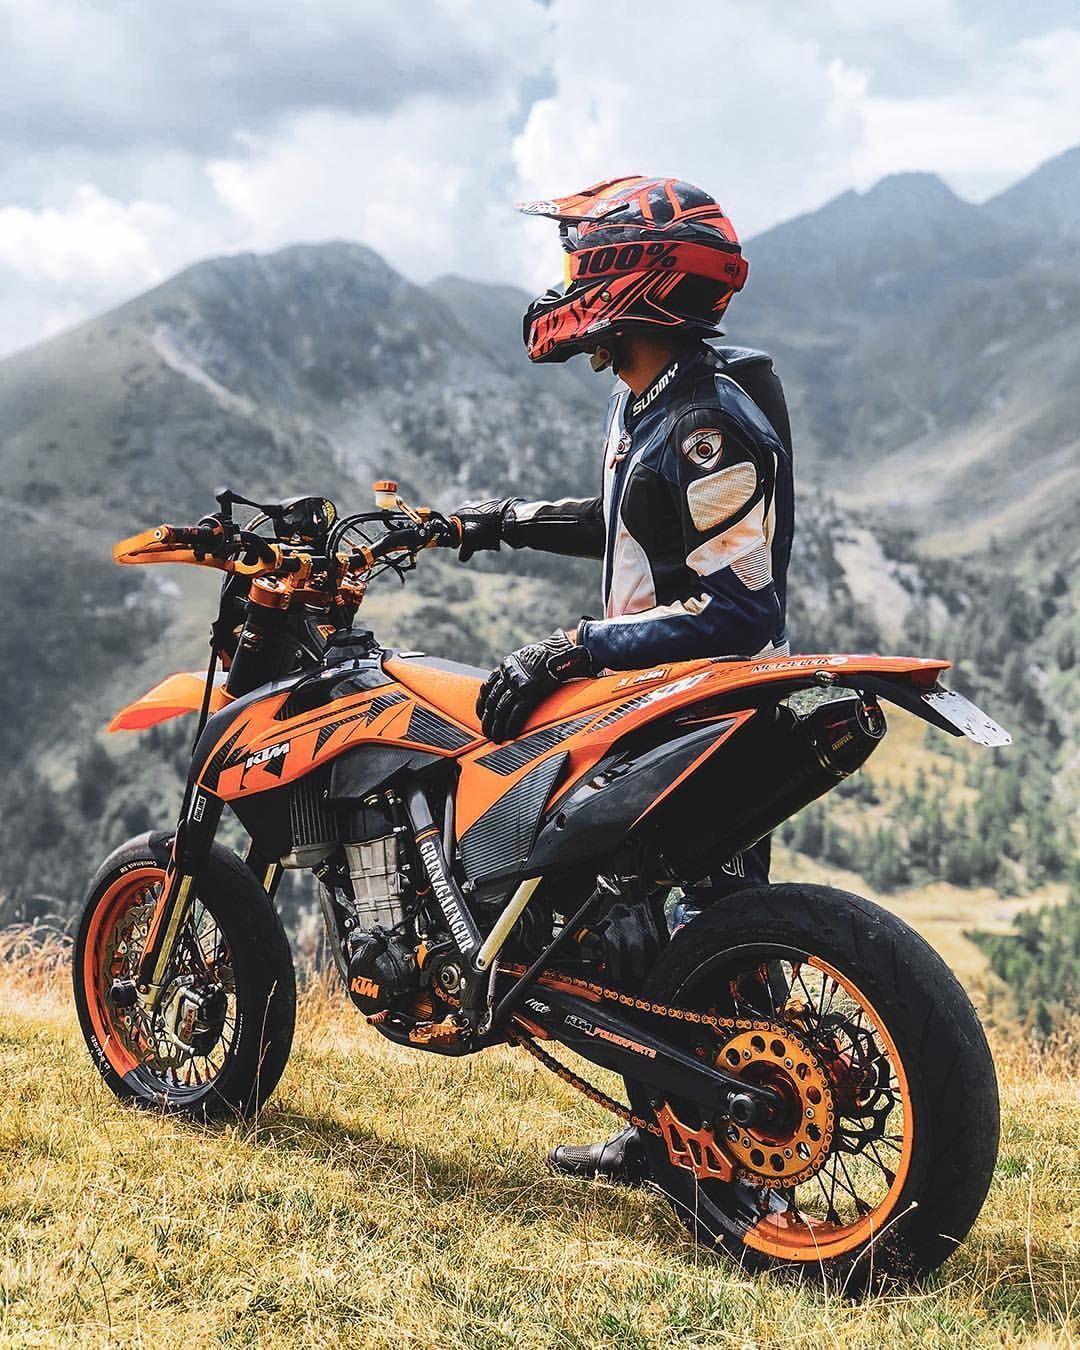 Pin by jimmy cabanillas on Motos in 2020 Motorcross bike